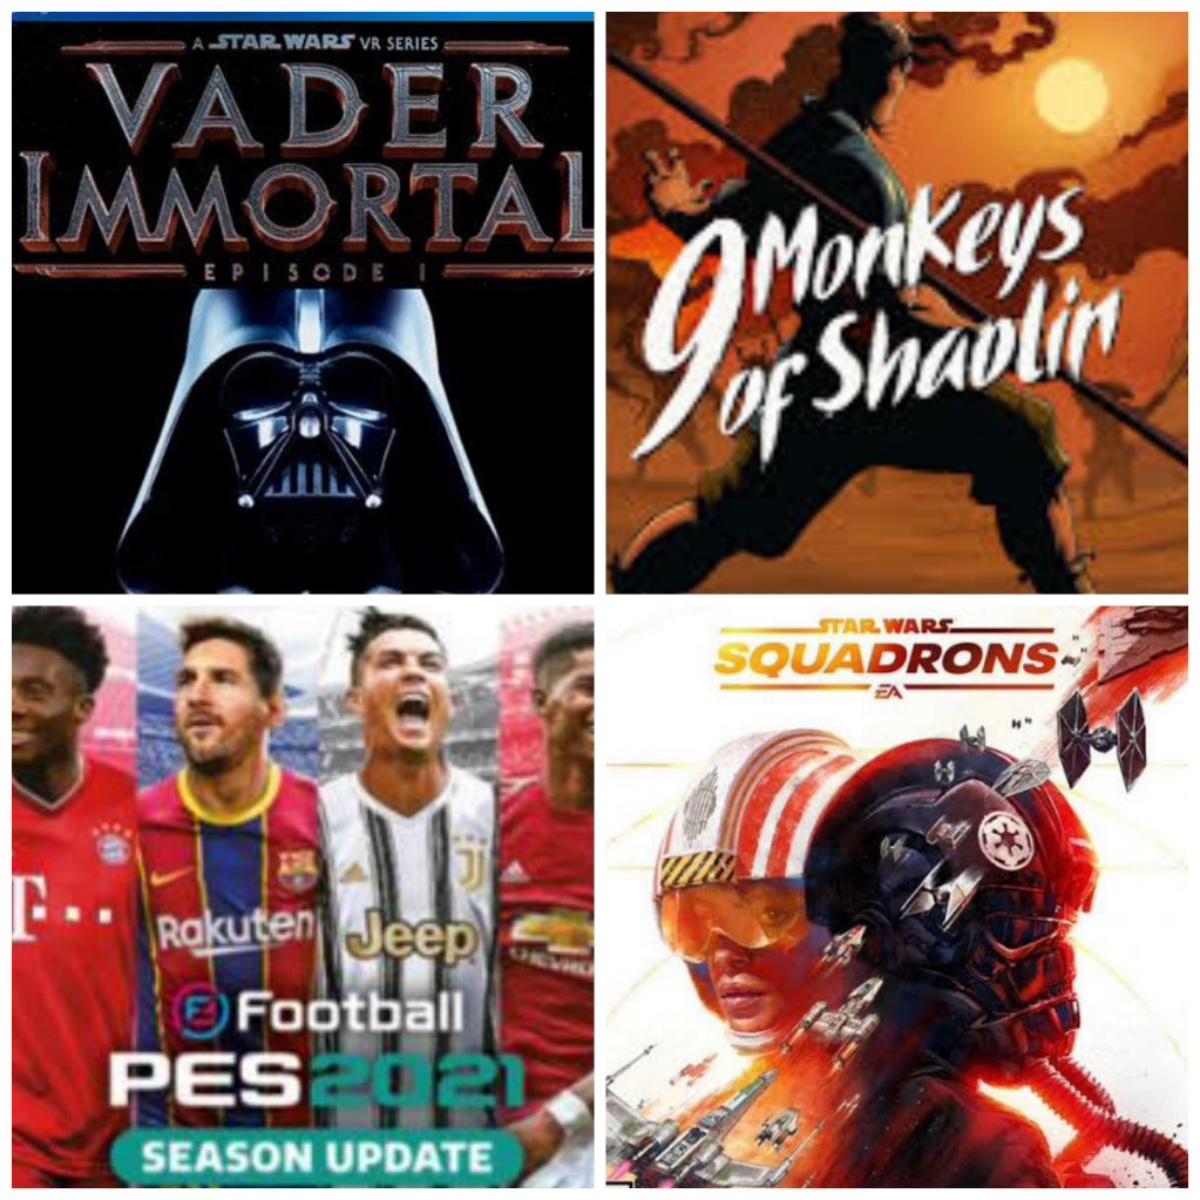 Reseña: Vader Immortal A Star Wars VR Series, Star Wars: Squadrons, eFootball PES 2021 y 9 Monkeys of Shaolin.